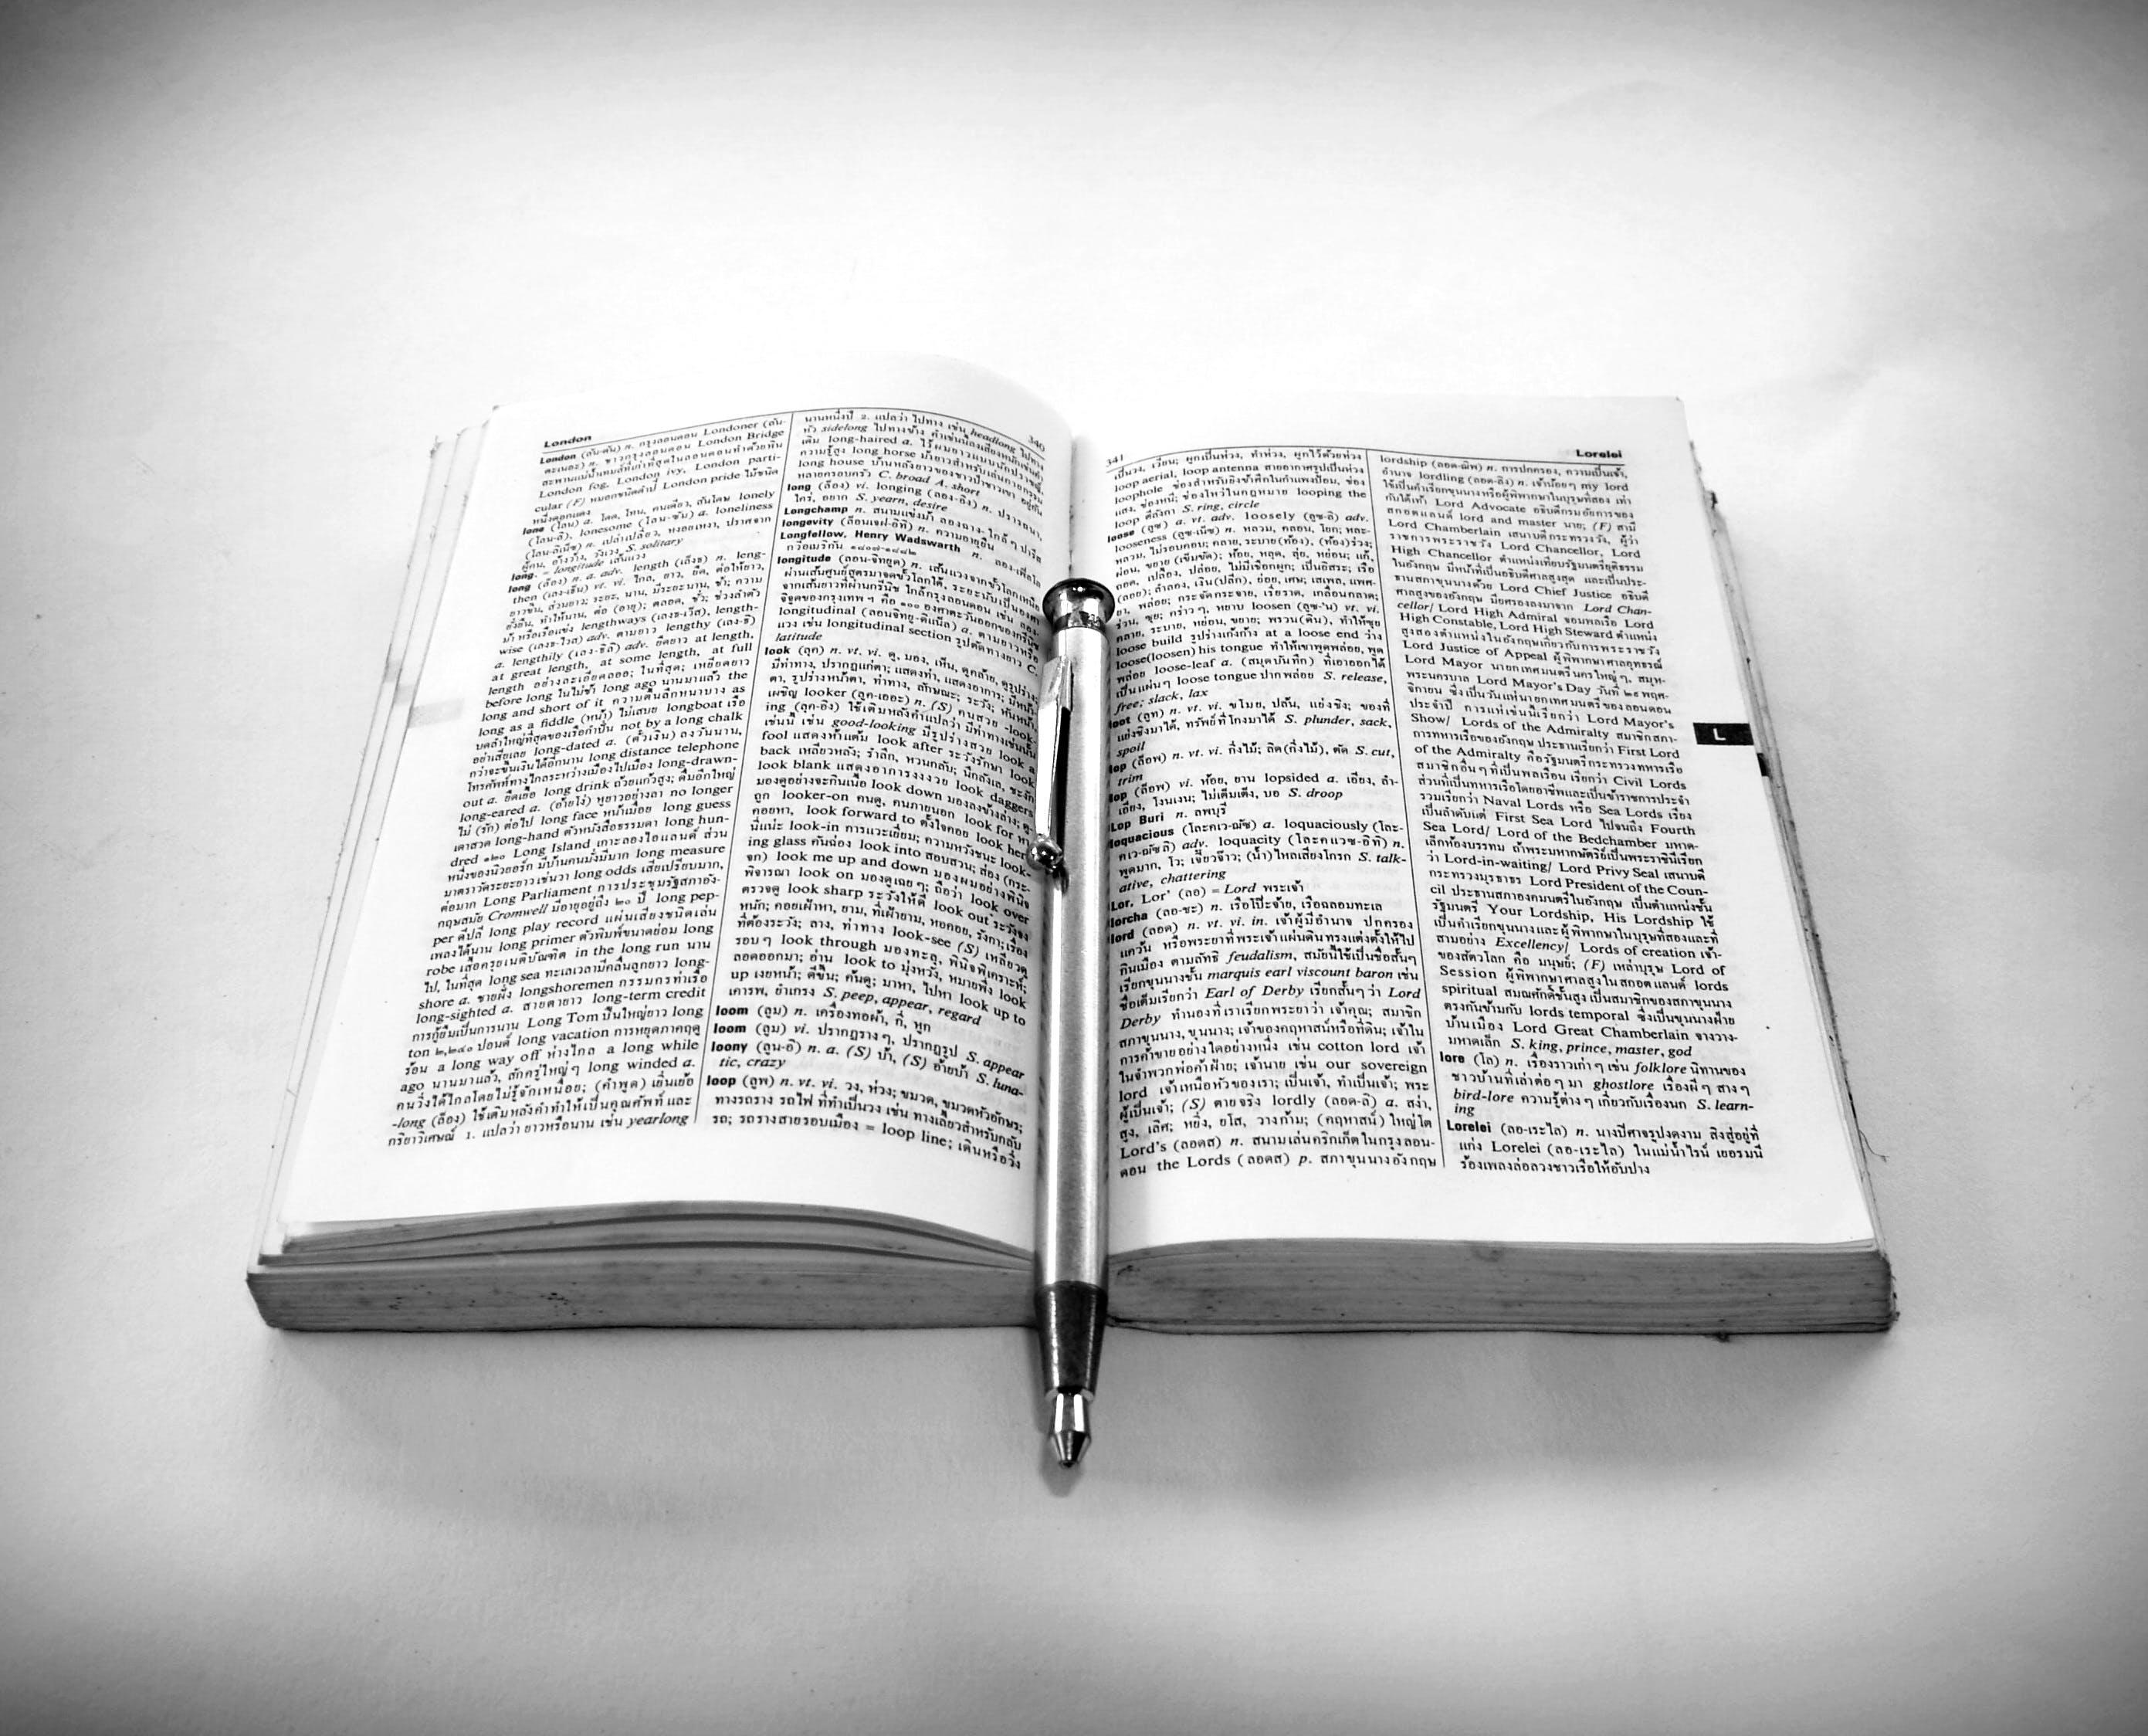 Book and Silver Click Pen